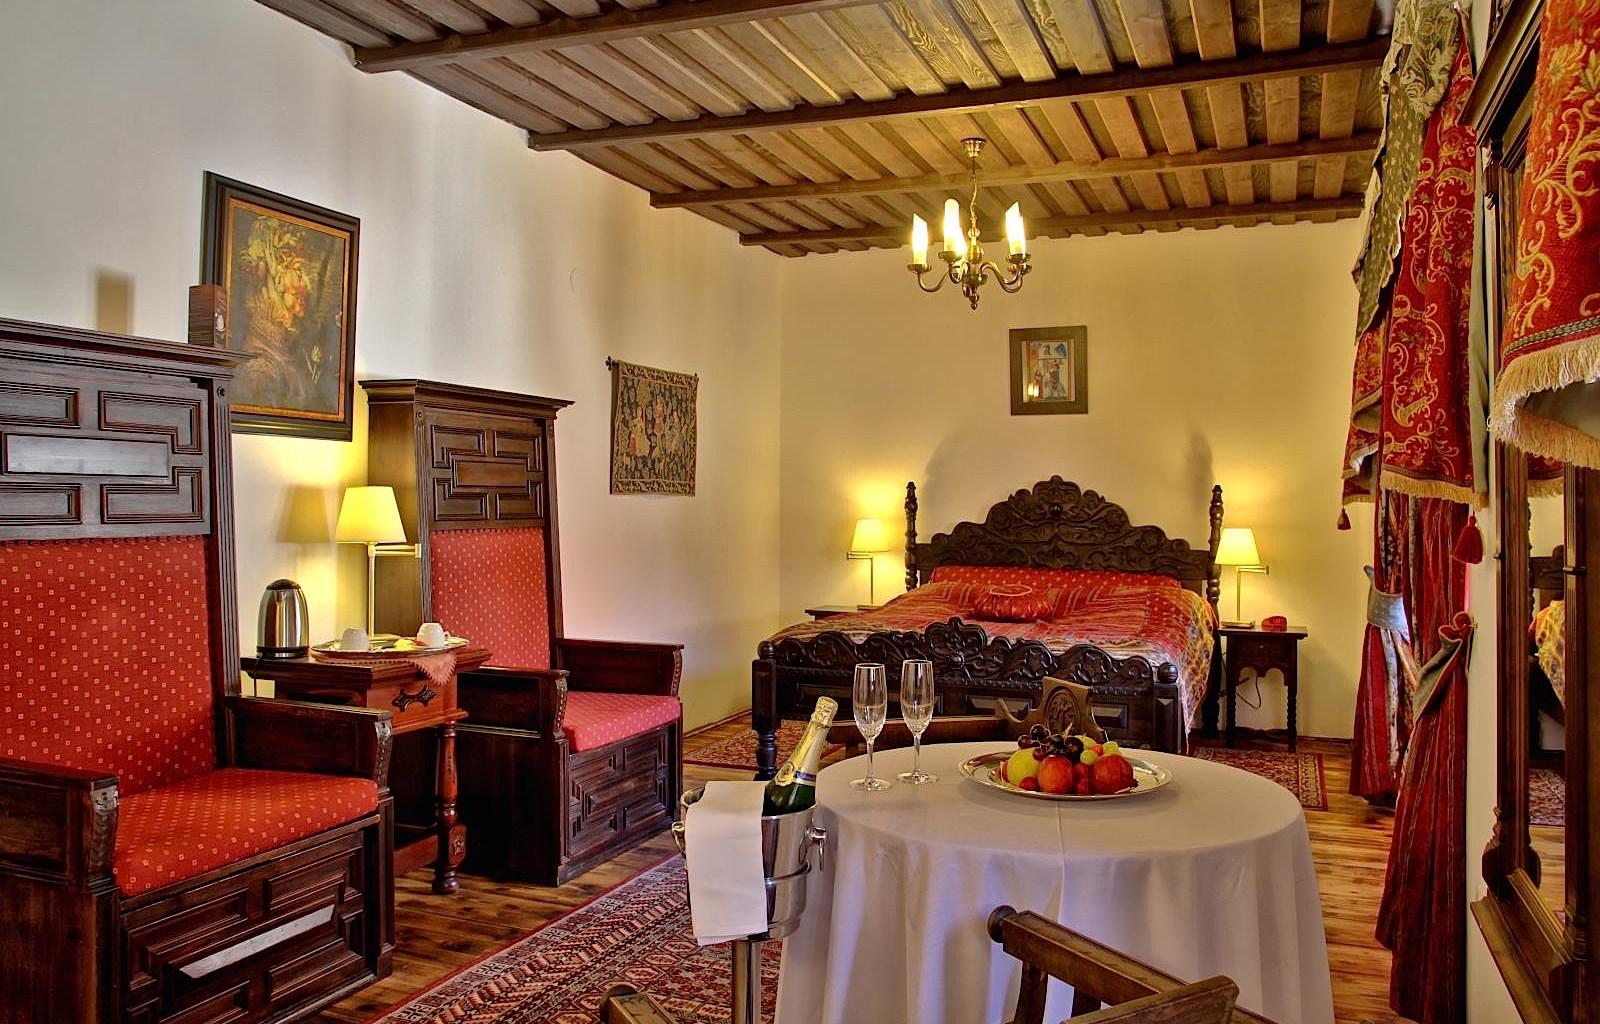 HotelRuze_Deluxeroom_2